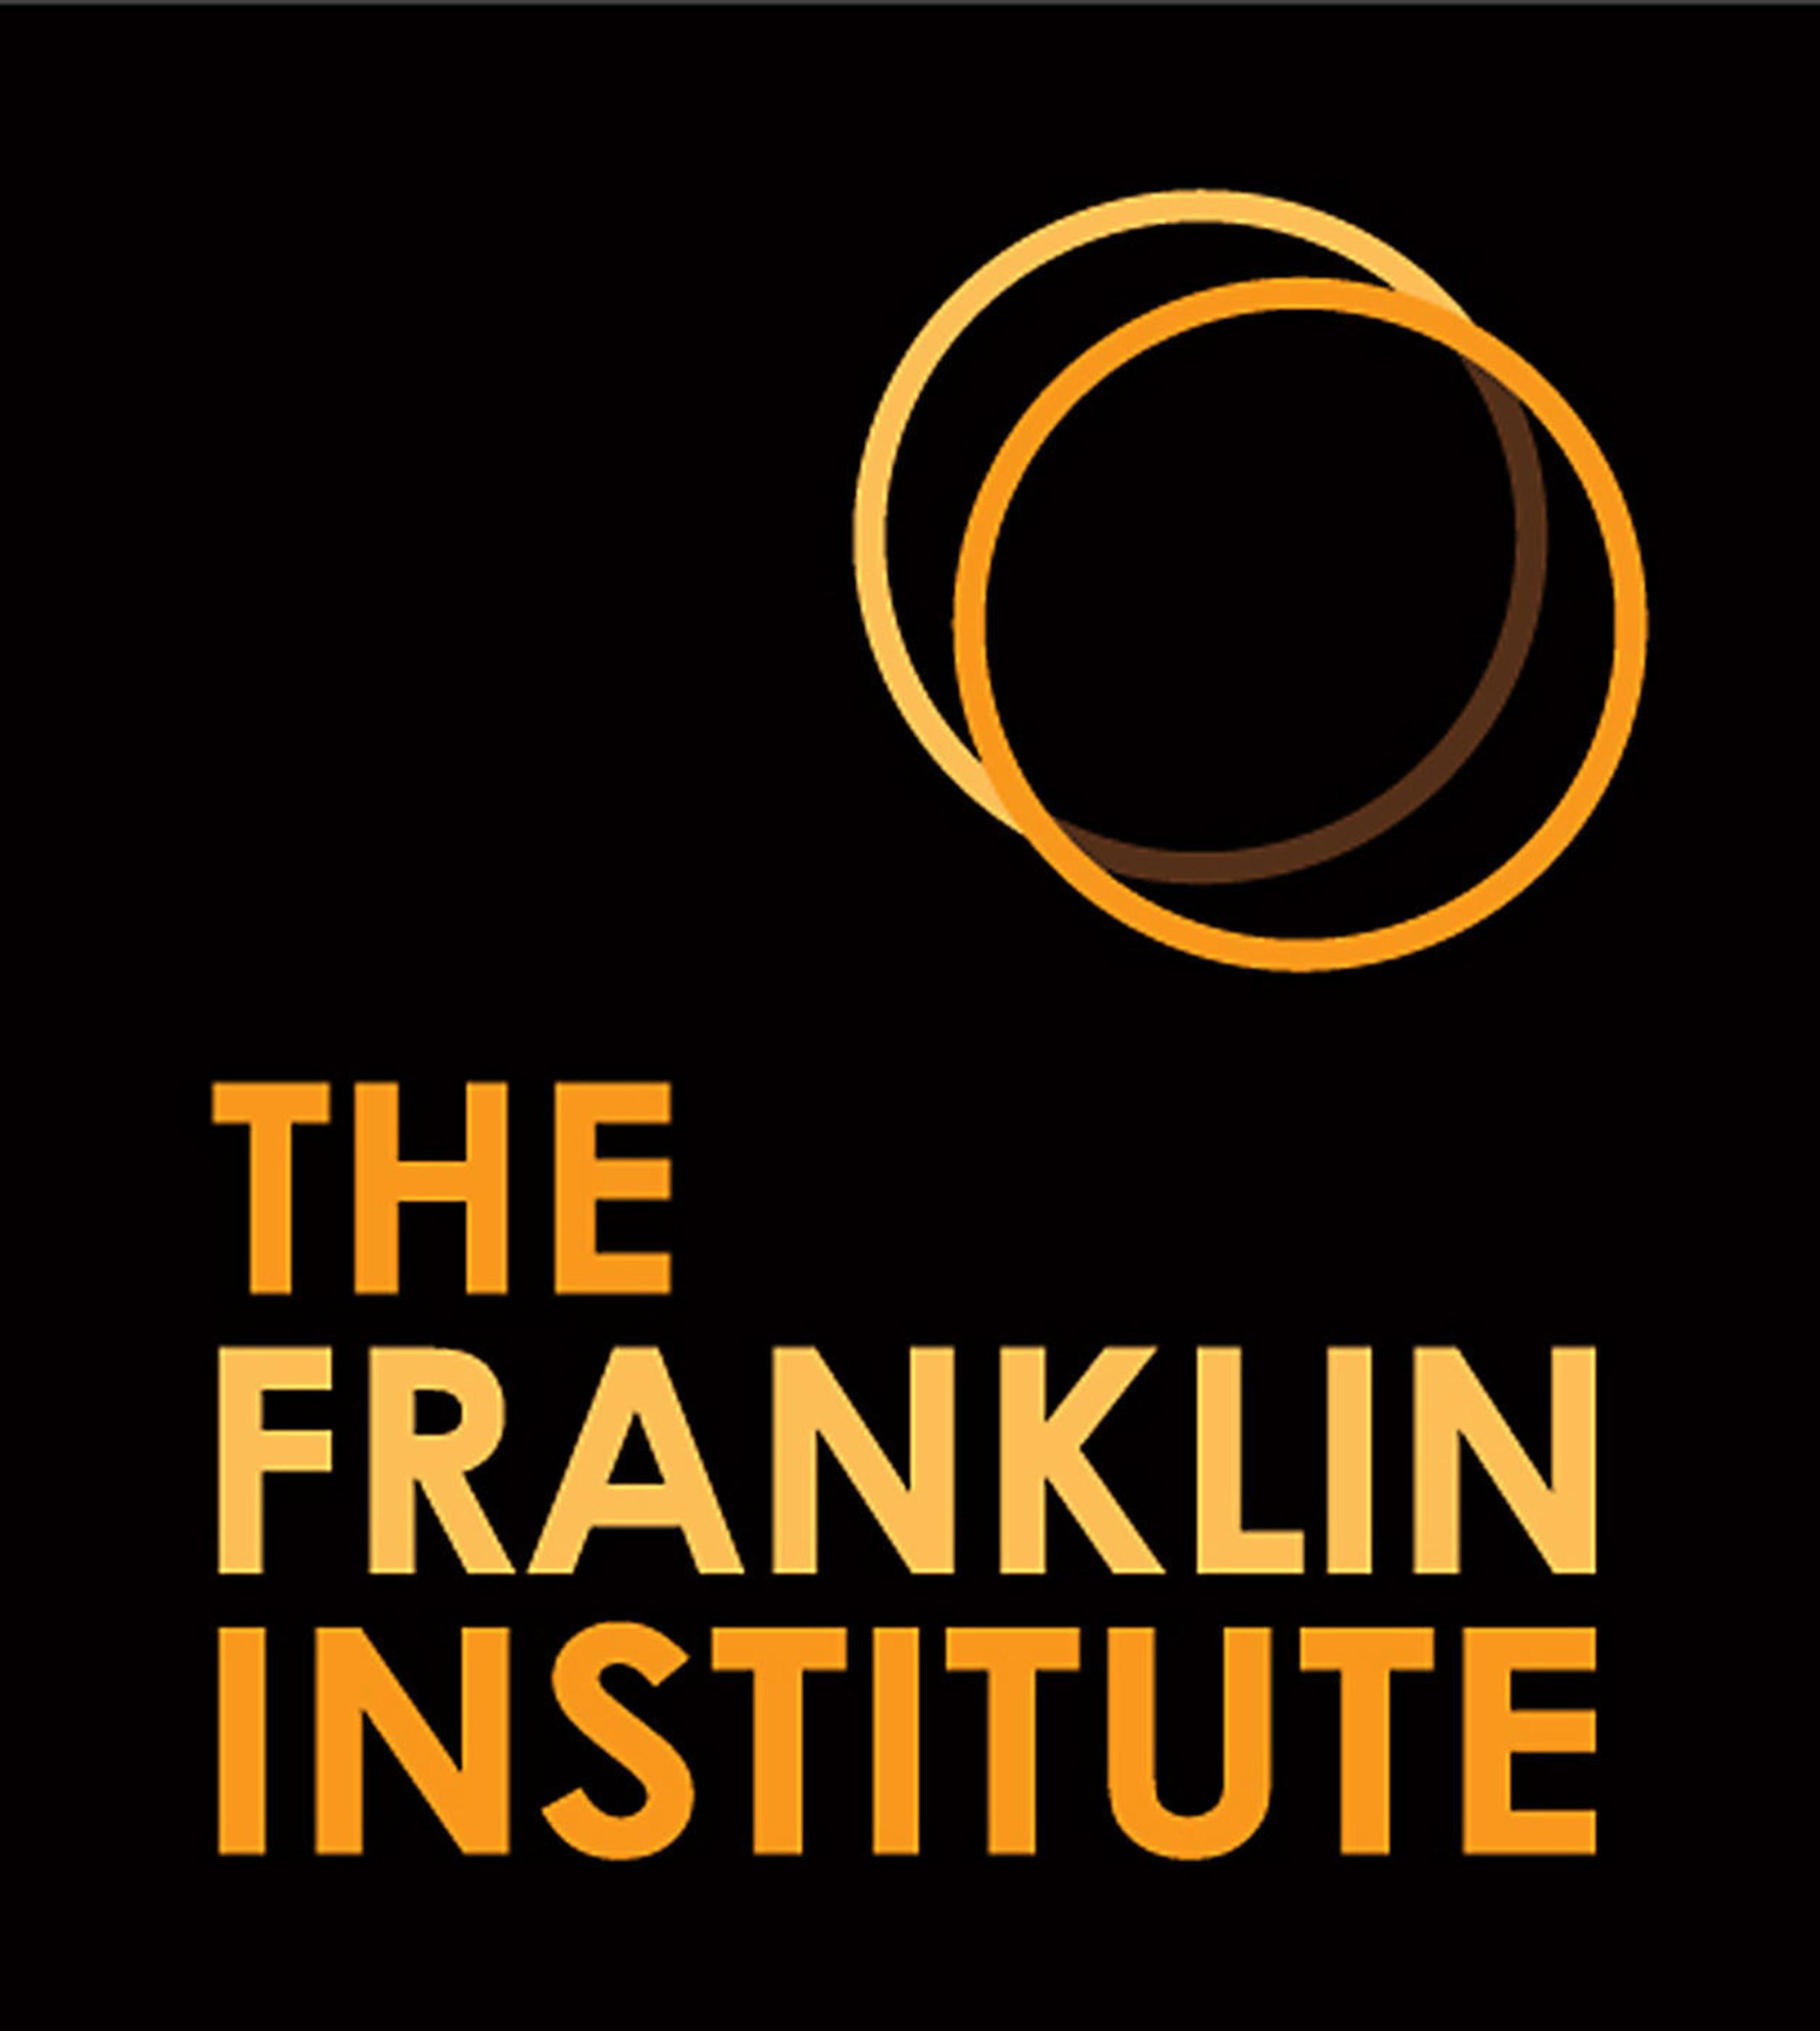 The Franklin Institute.